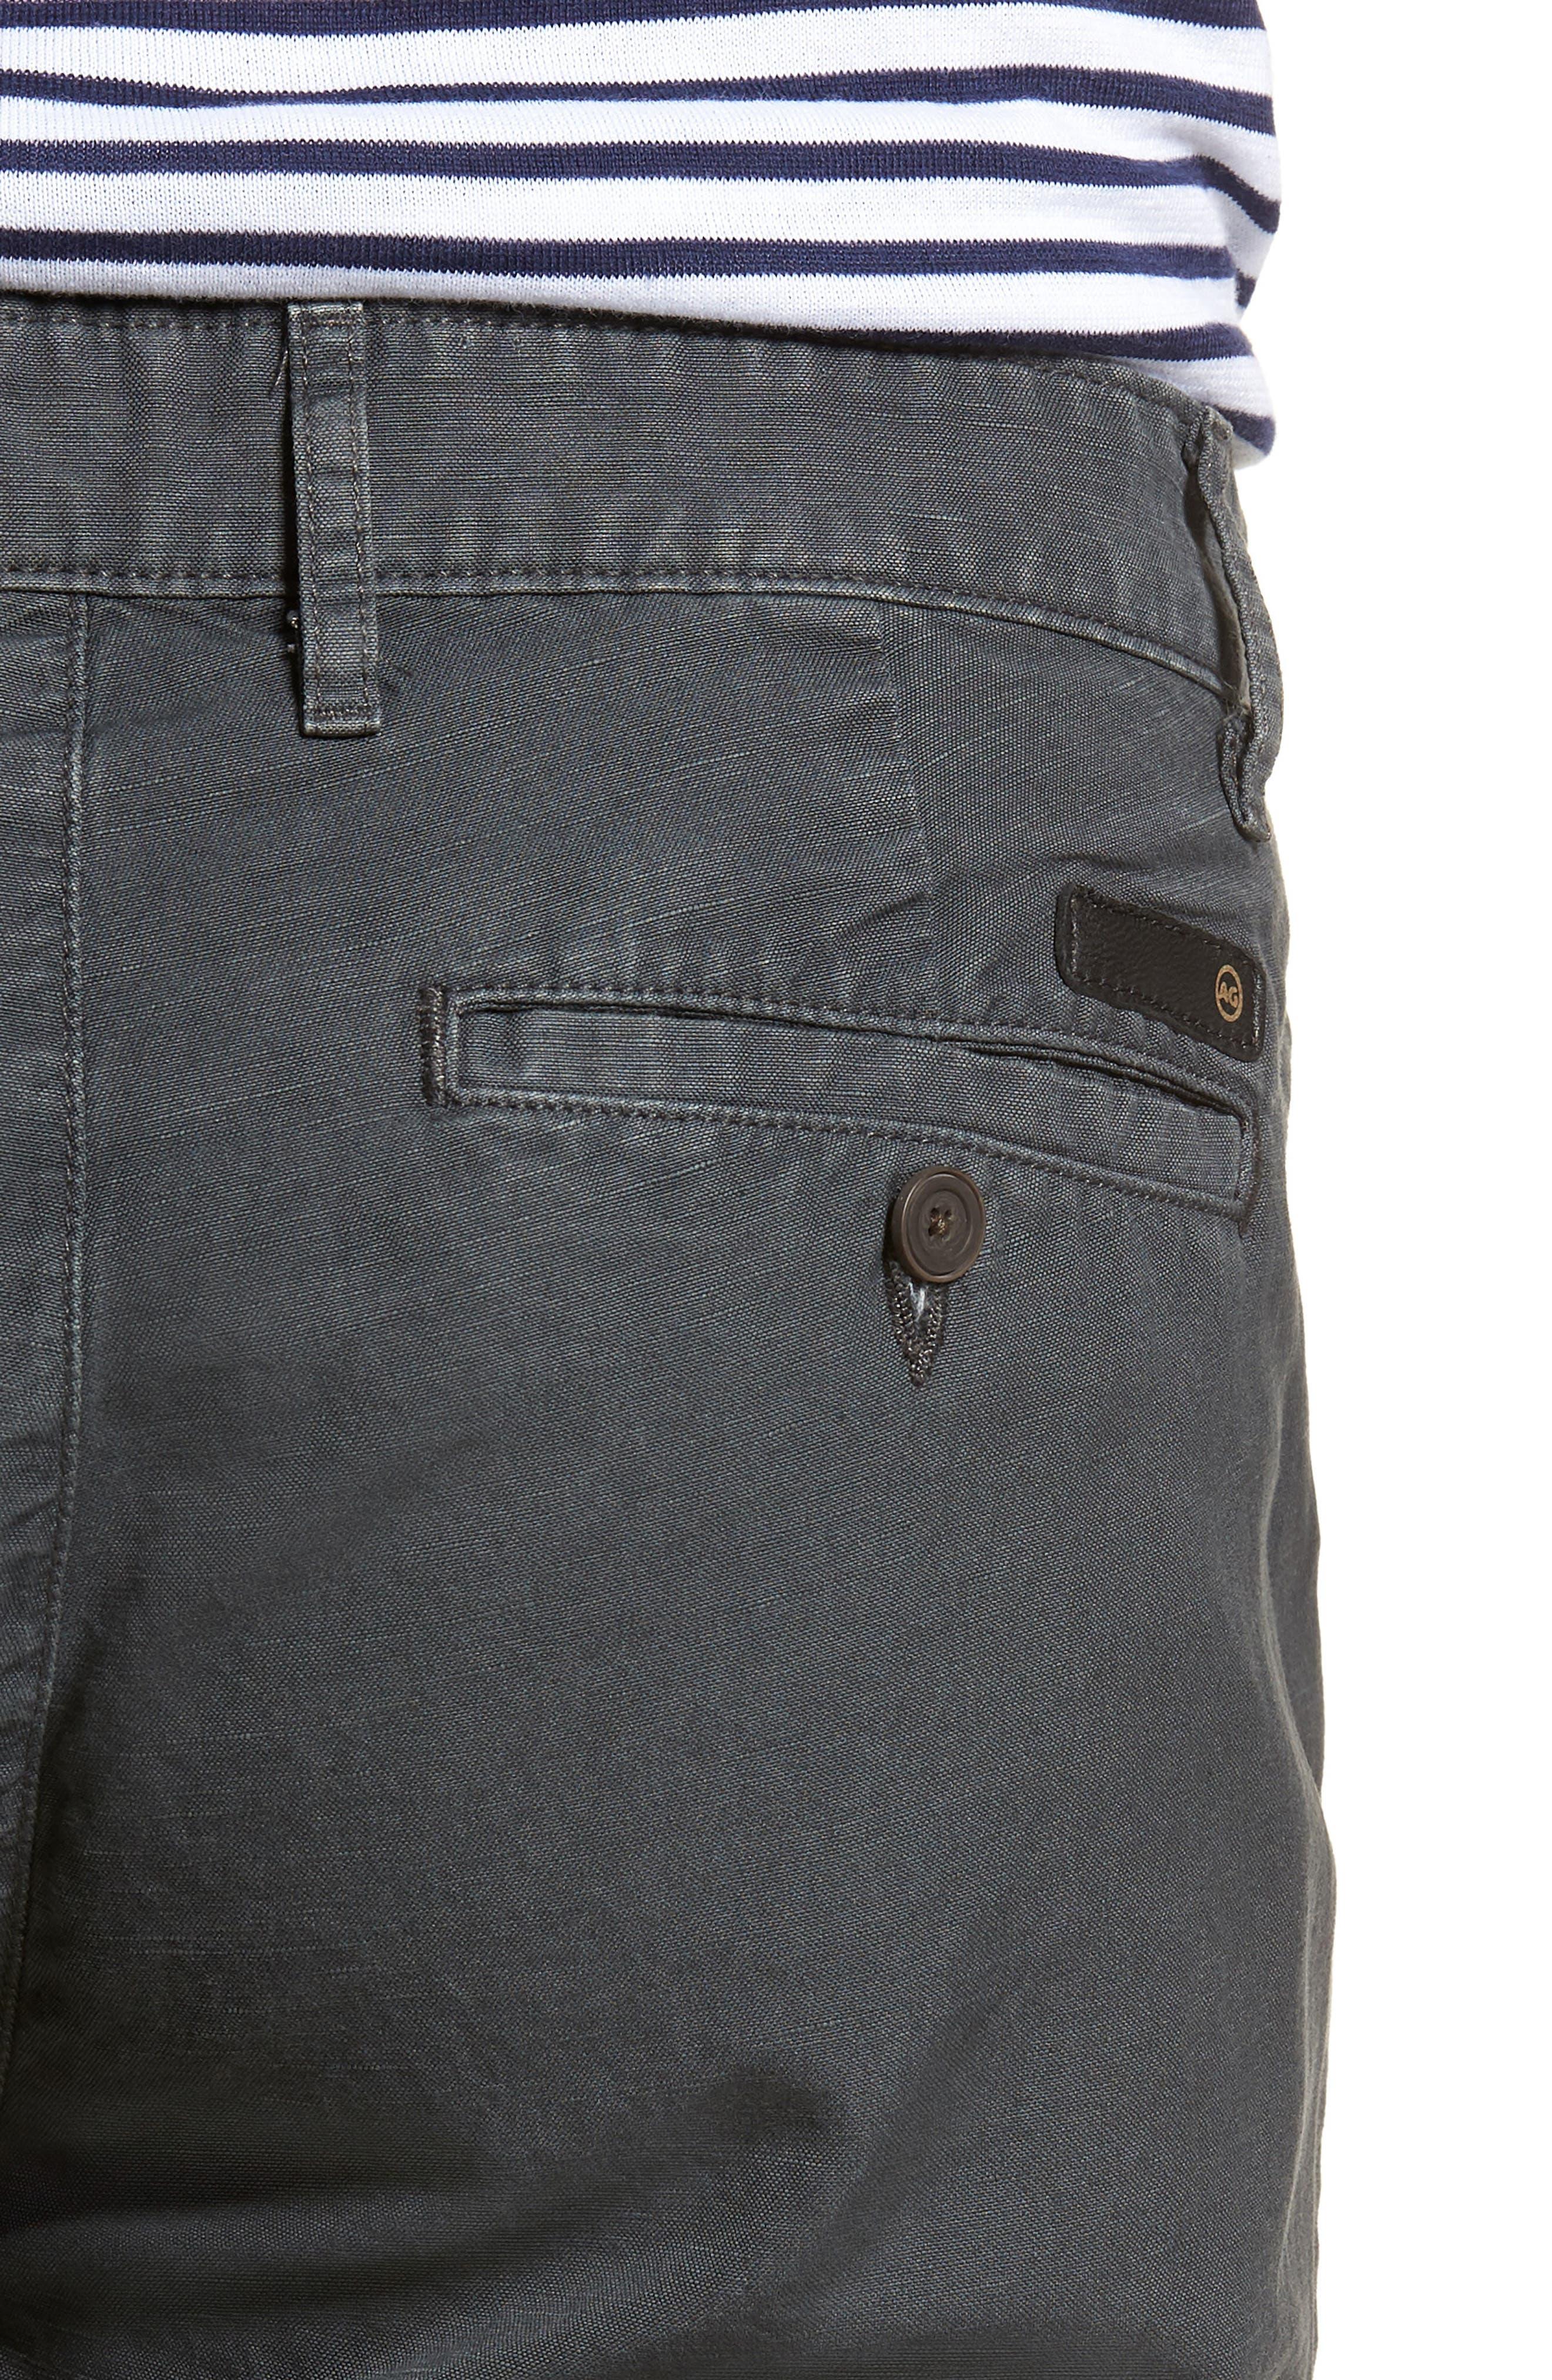 Wanderer Slim Fit Cotton & Linen Shorts,                             Alternate thumbnail 4, color,                             SULFUR SMOKE GREY